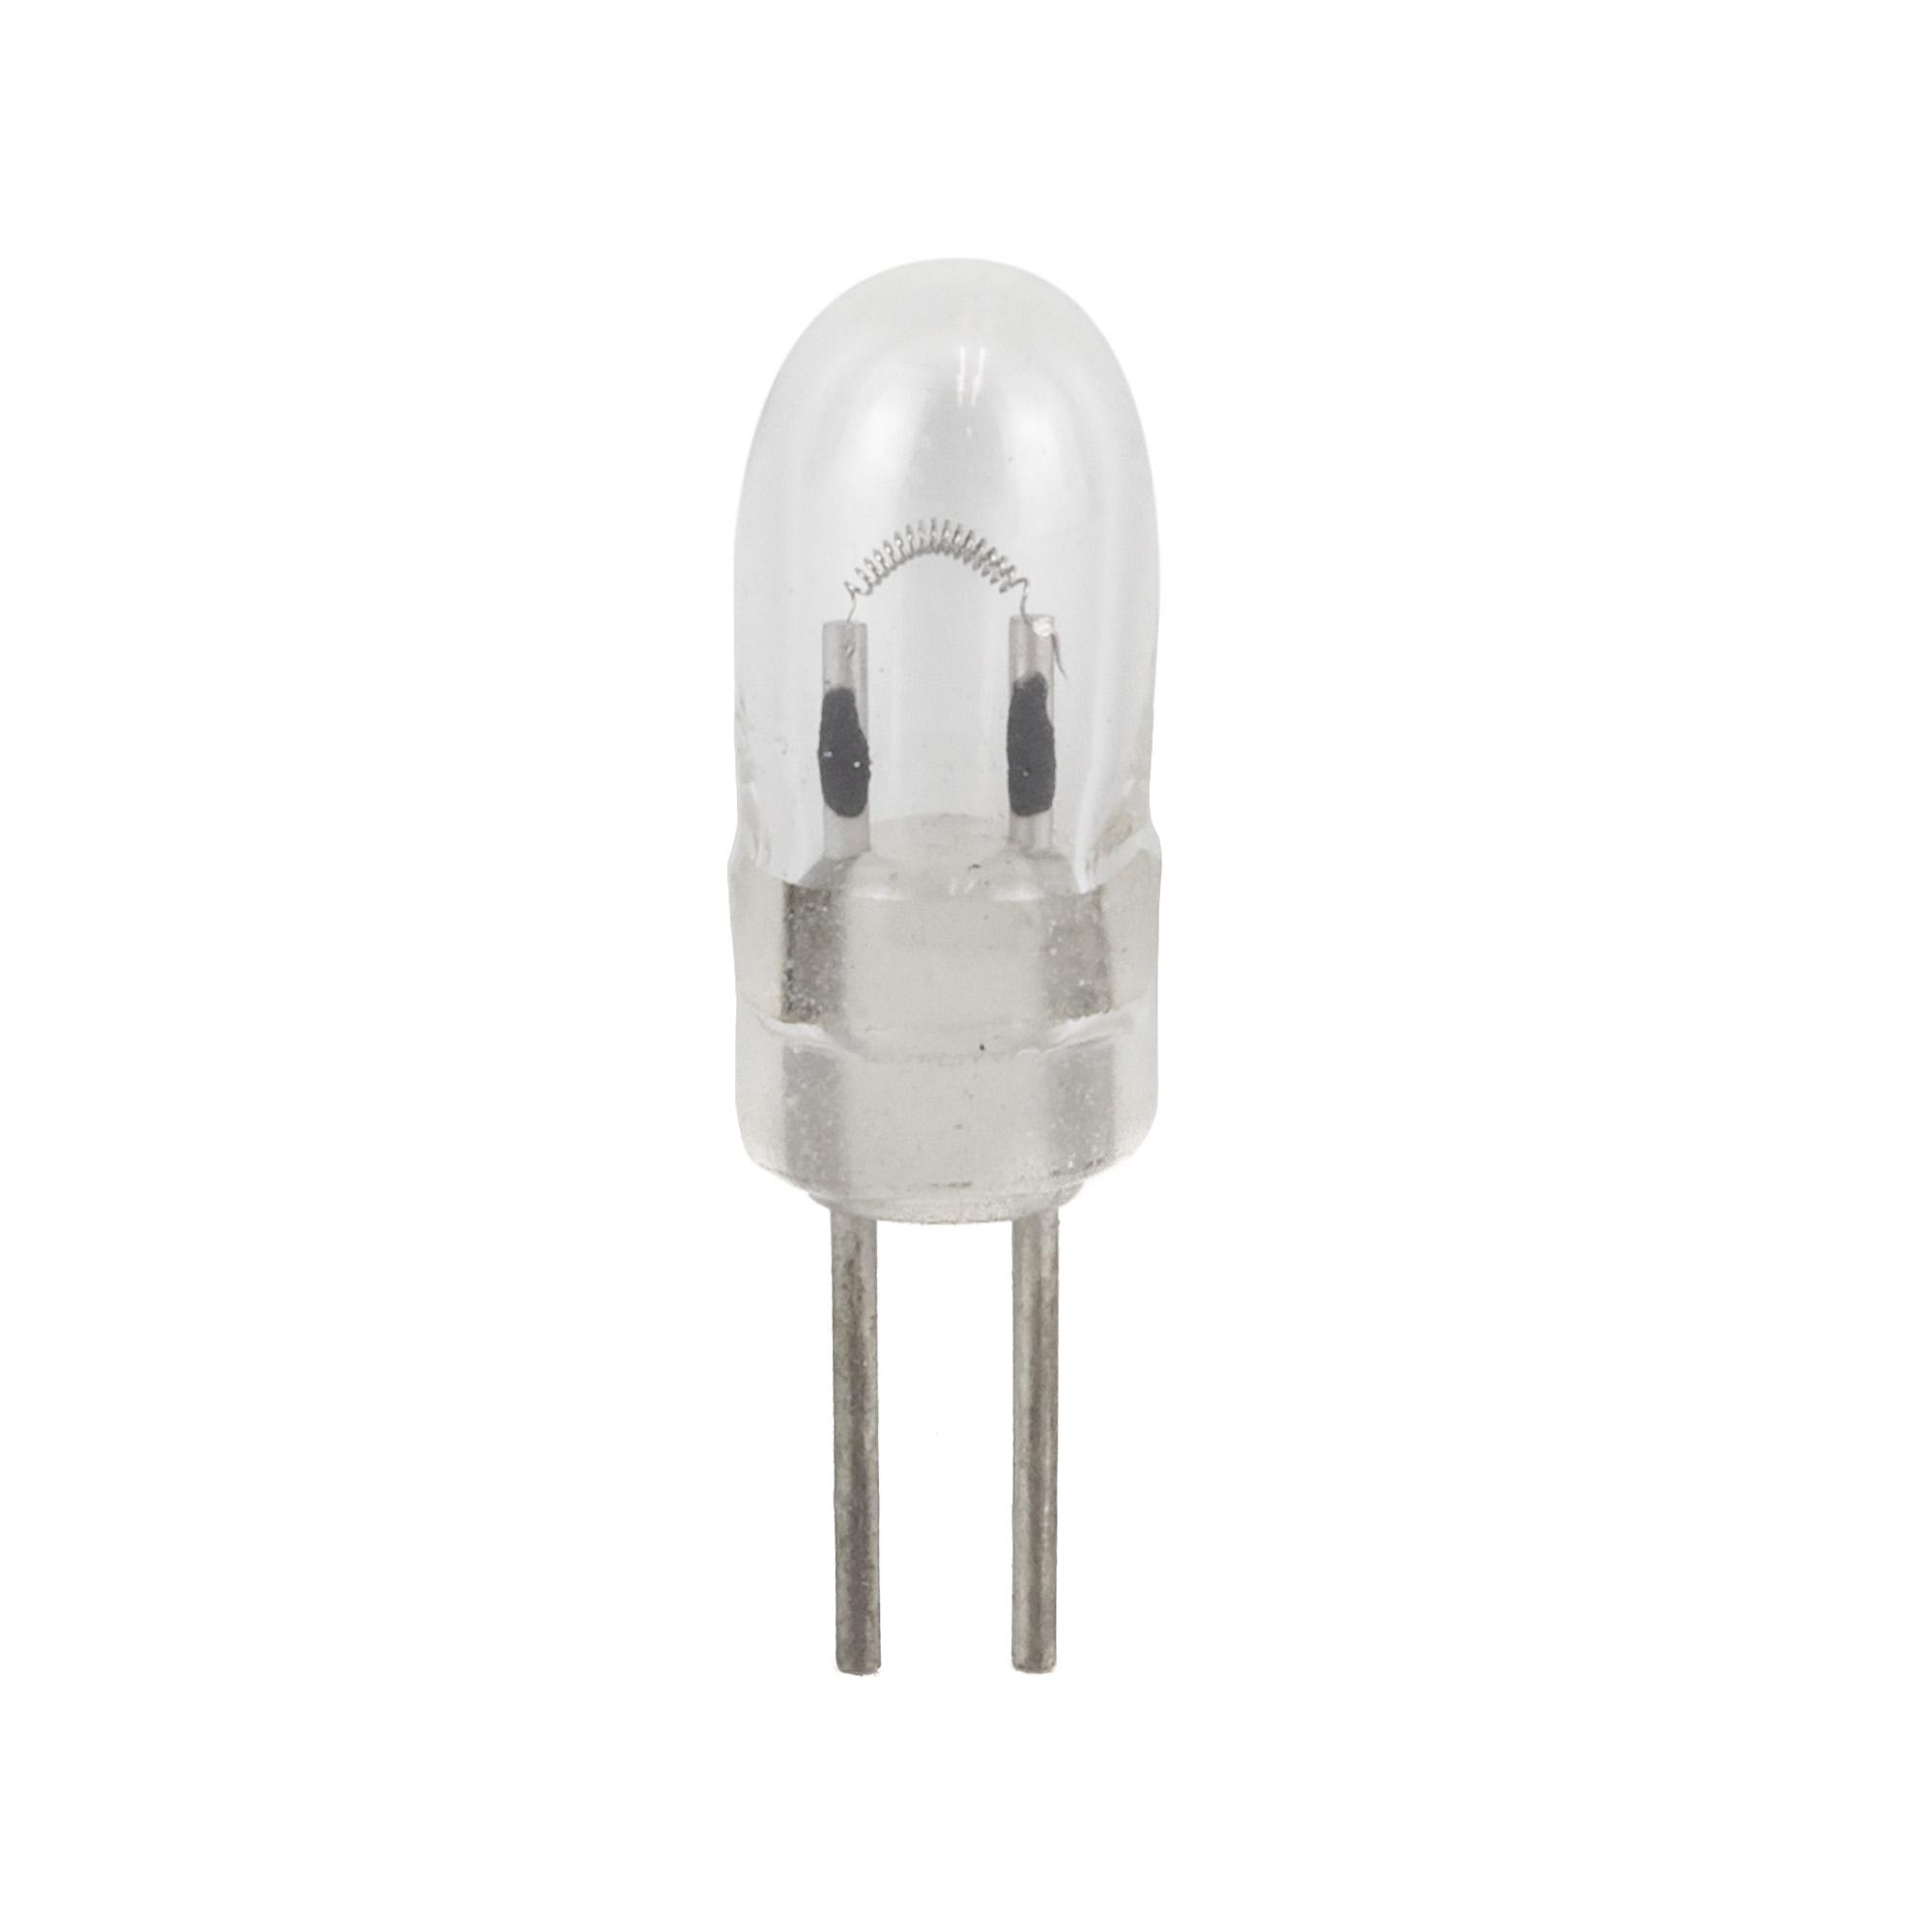 Glock Oem Tact Light Bulb Rplcmnt